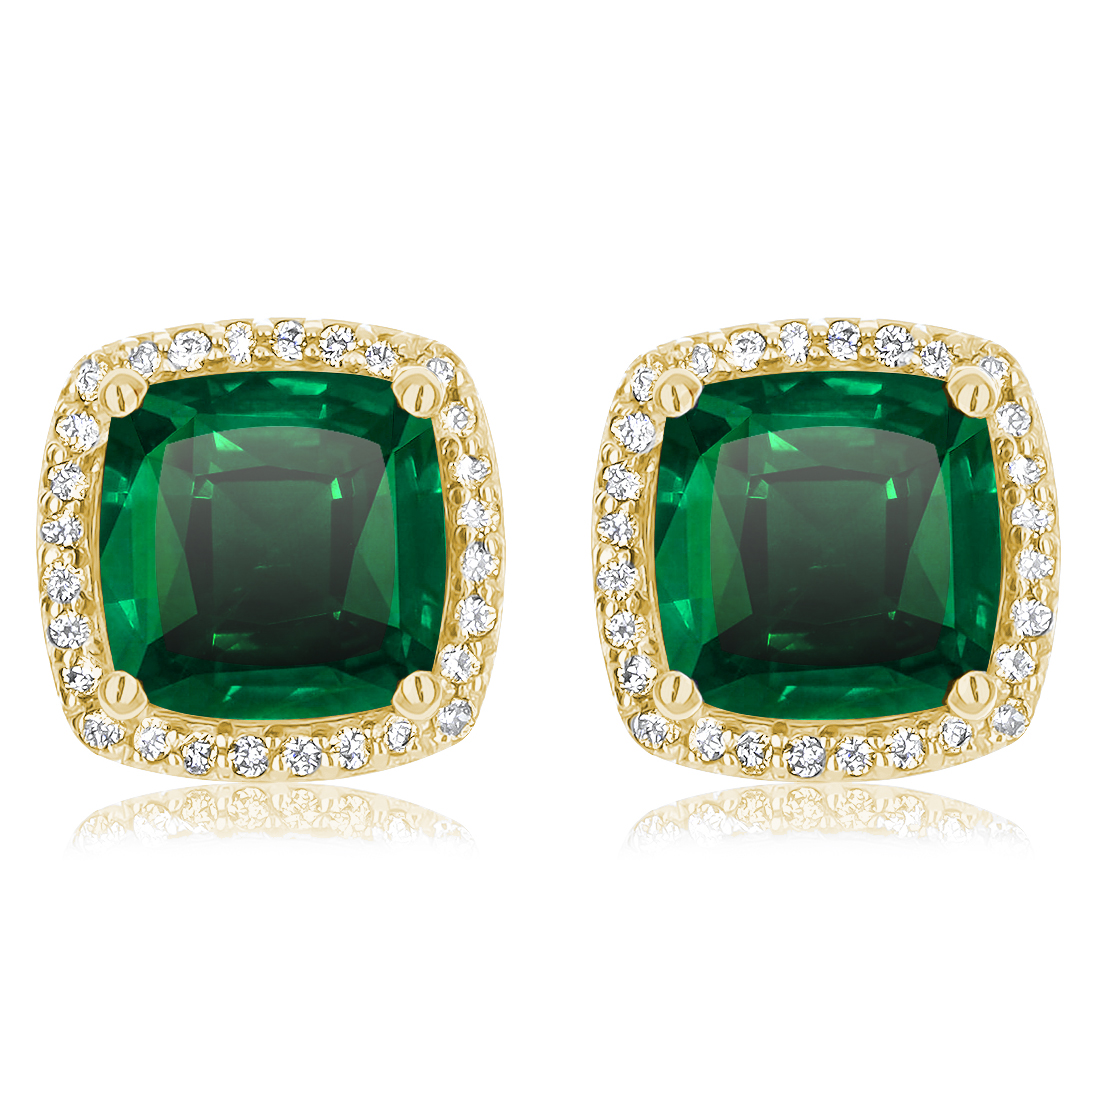 Christine Cushion Simulated Emerald Halo CZ Stud Earrings